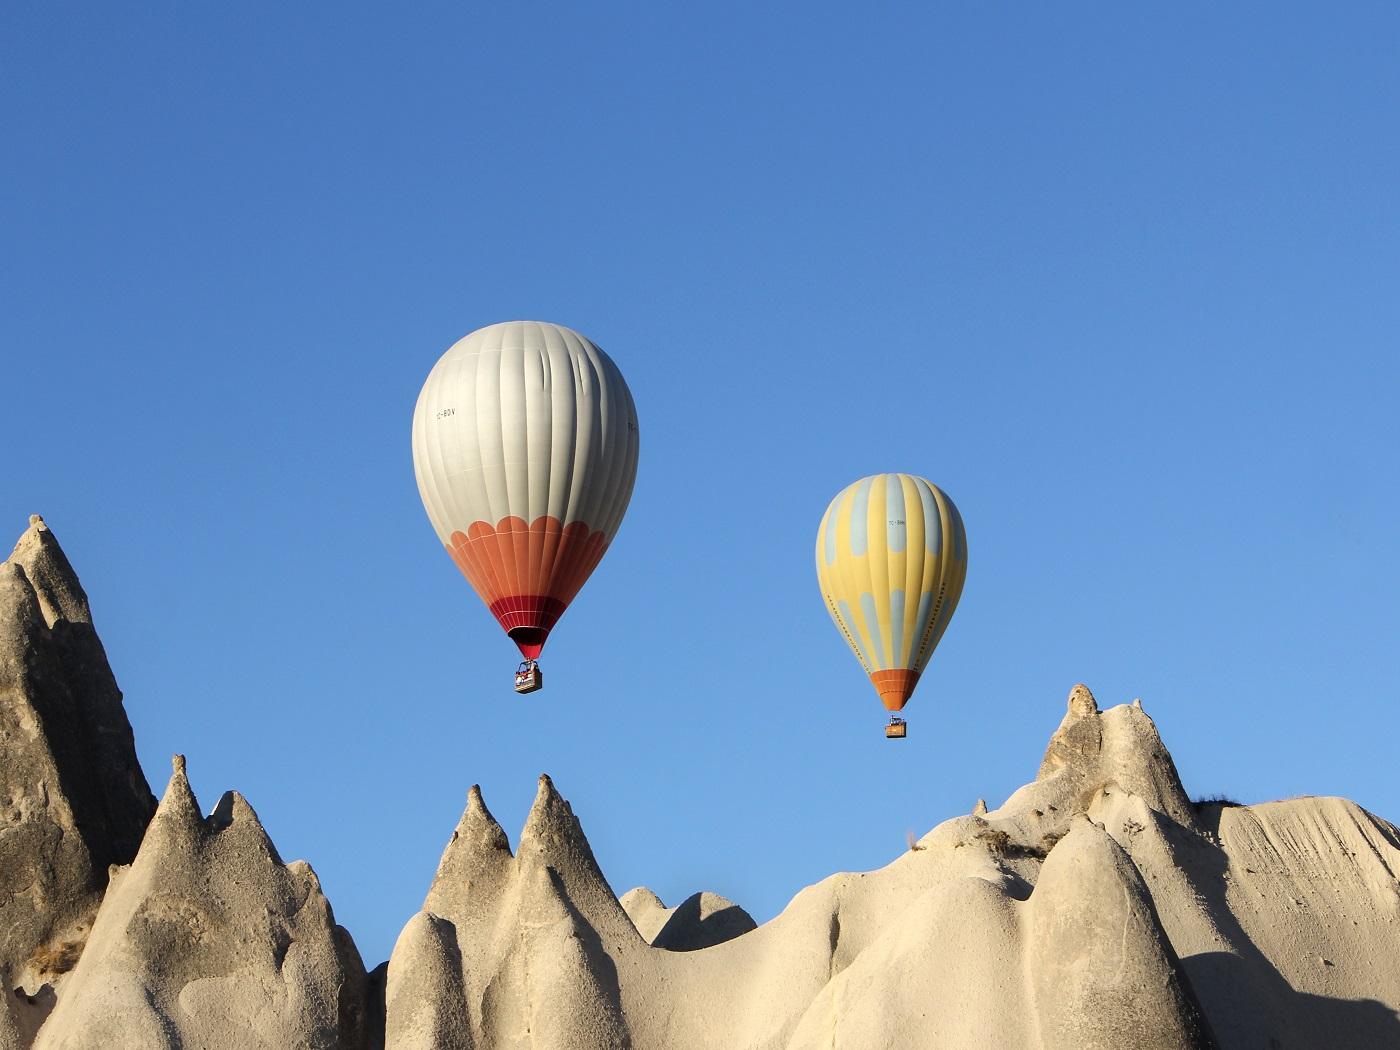 Uçan Balonla Uzay Yolculuğu: Space Perspective